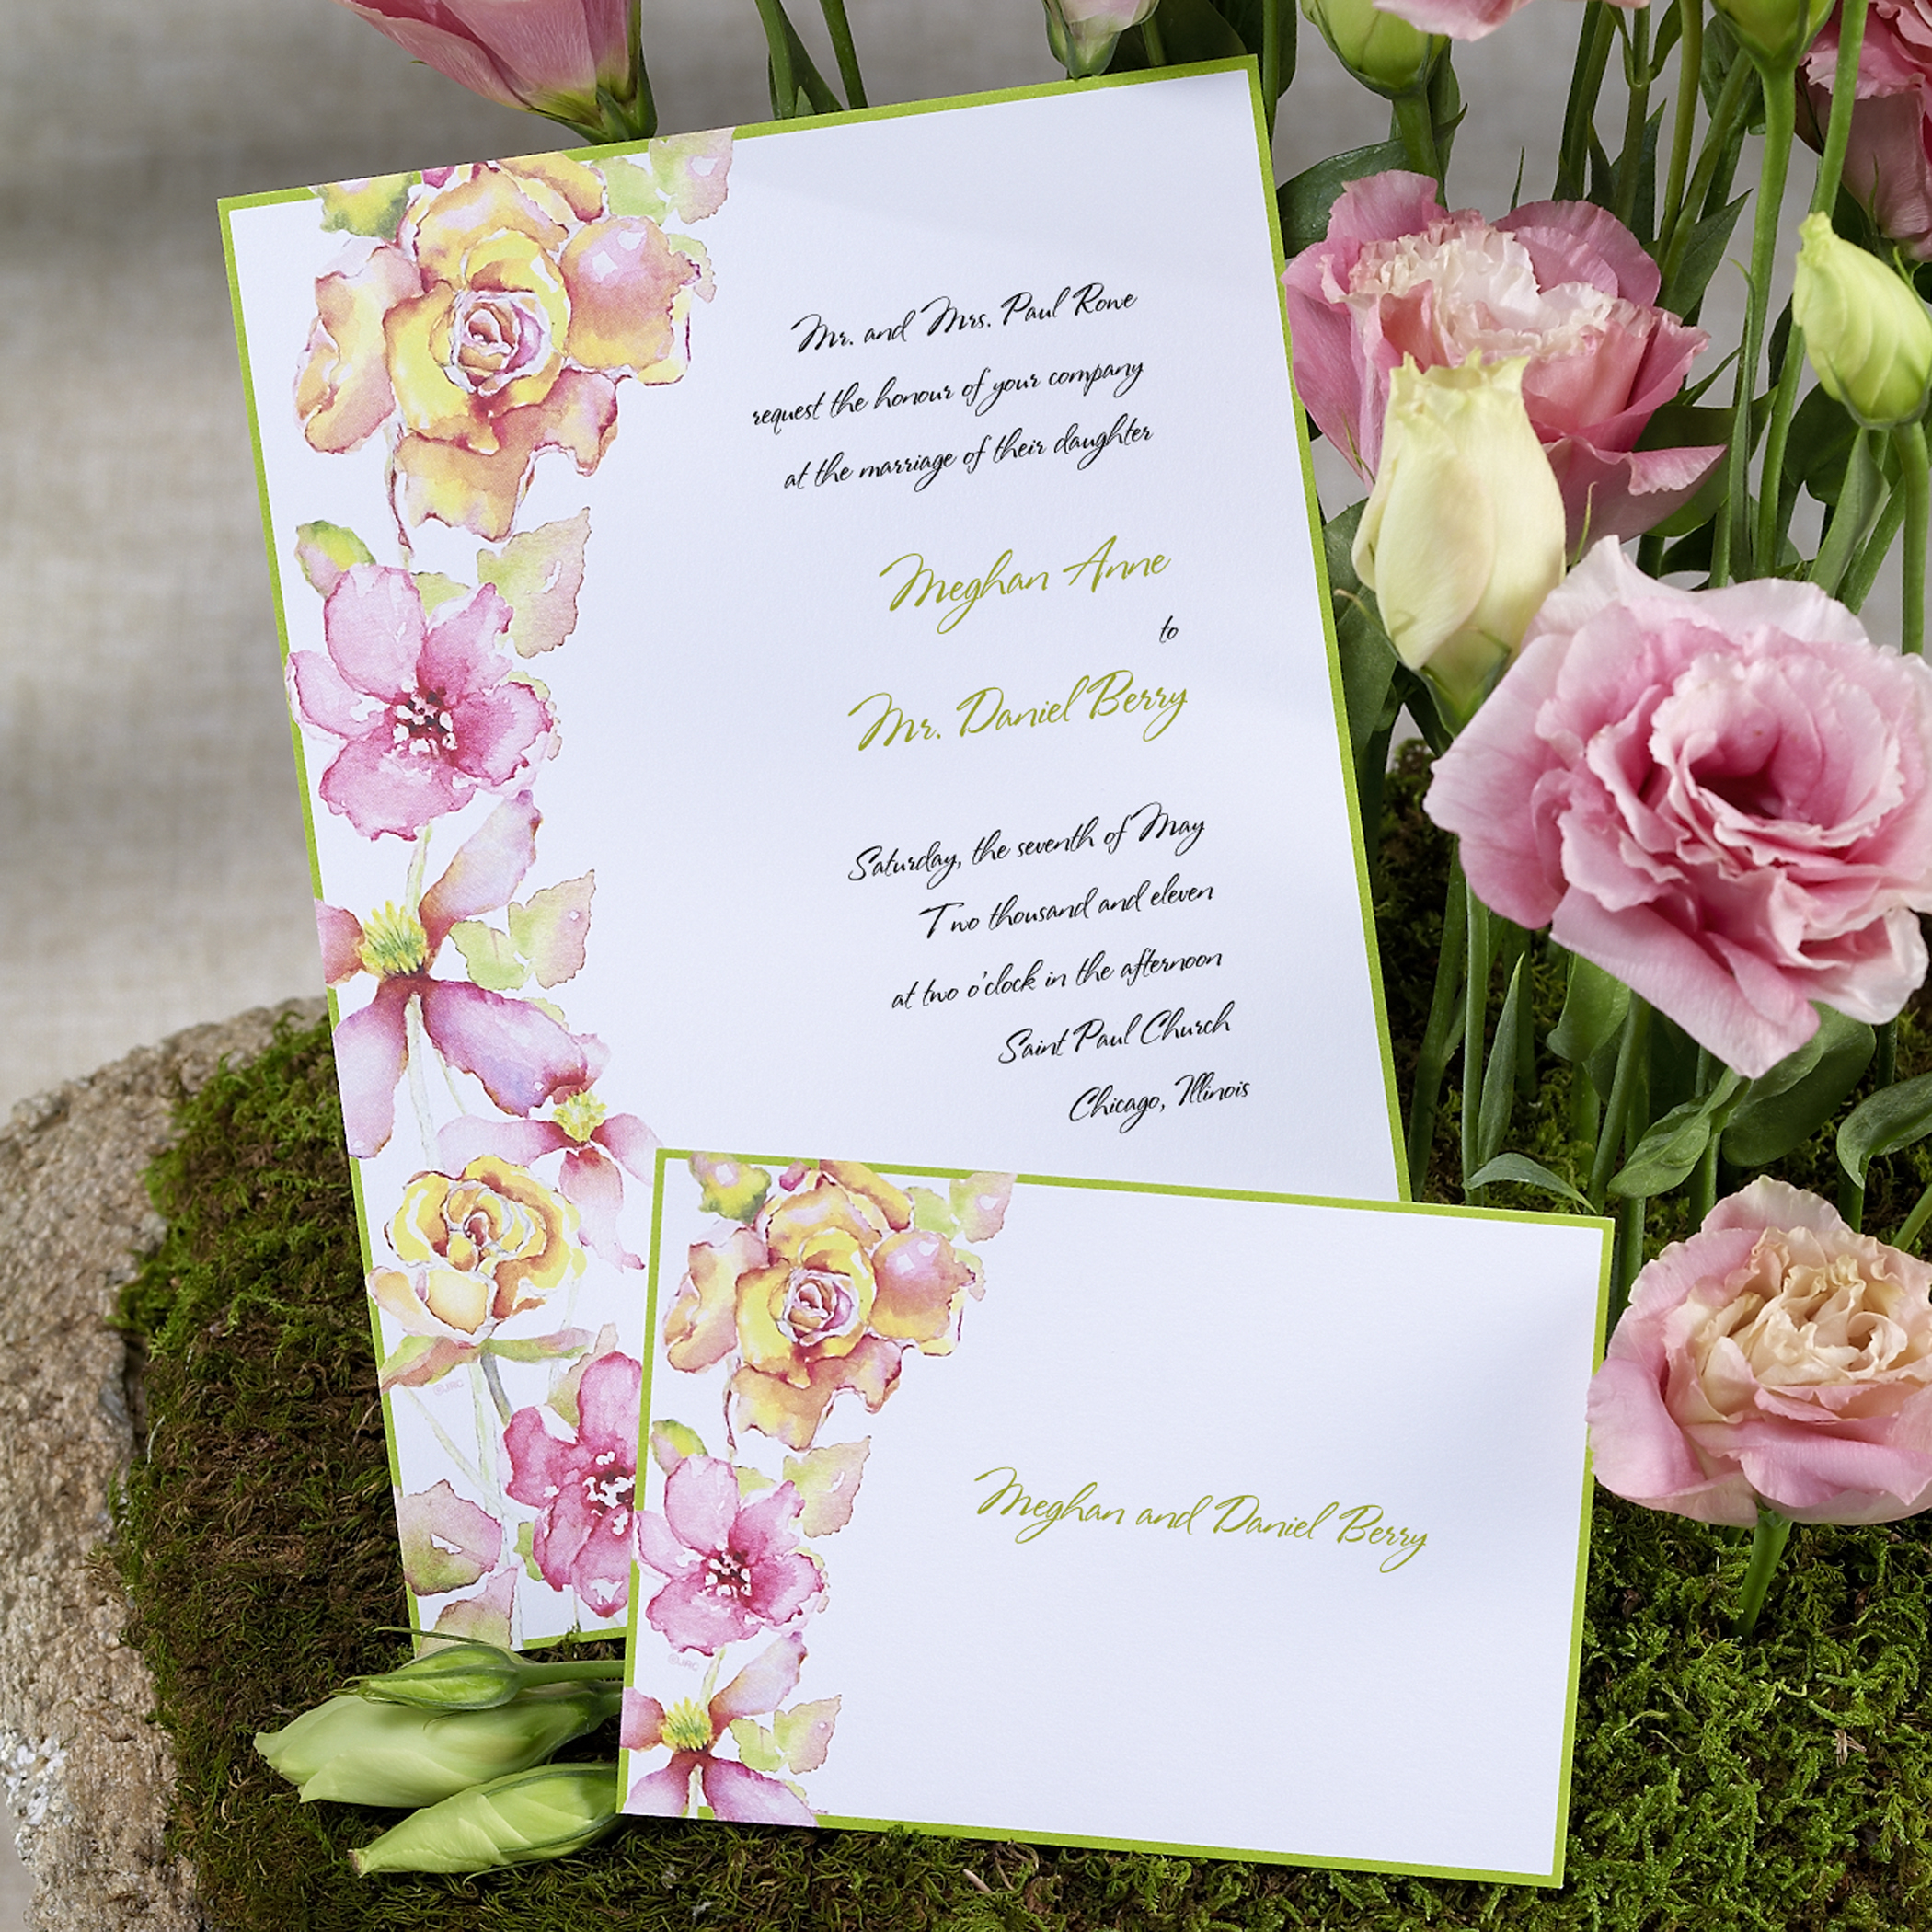 Outdoor Themed Wedding Invitations: Green Wedding Invitations Oklahoma Elegant Vintage Outdoor